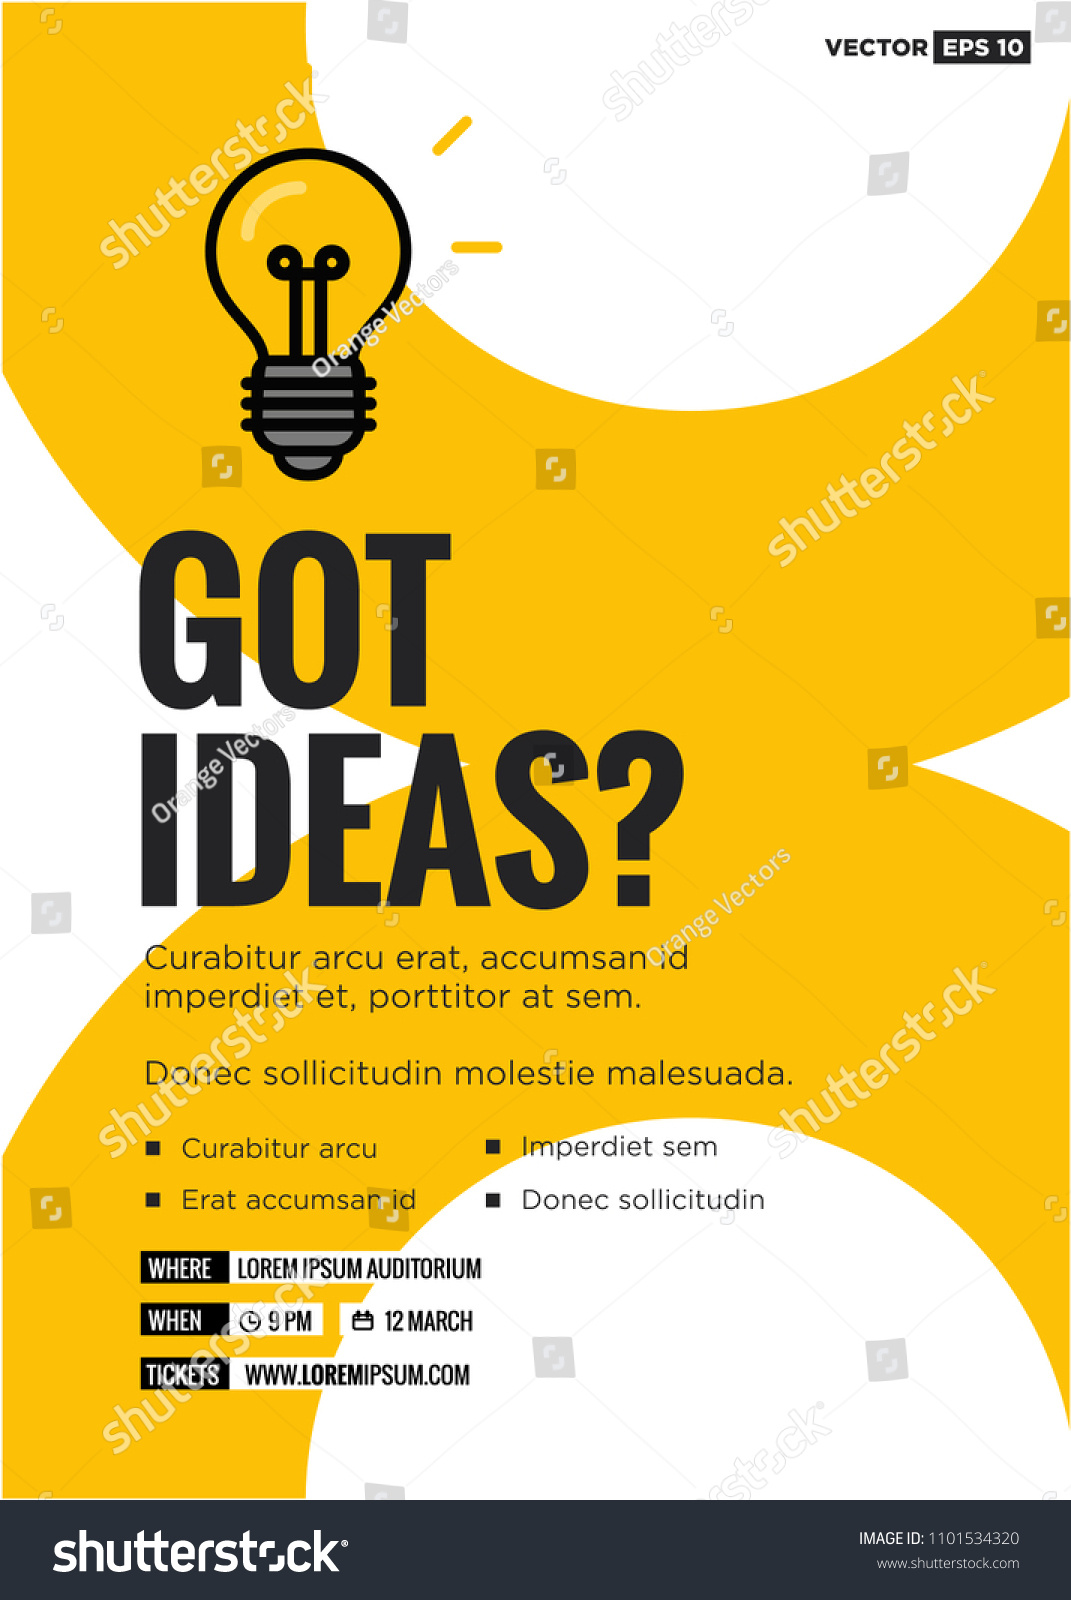 Got Ideas Event Poster Bulb Illustration Stock Vector Royalty Free 1101534320